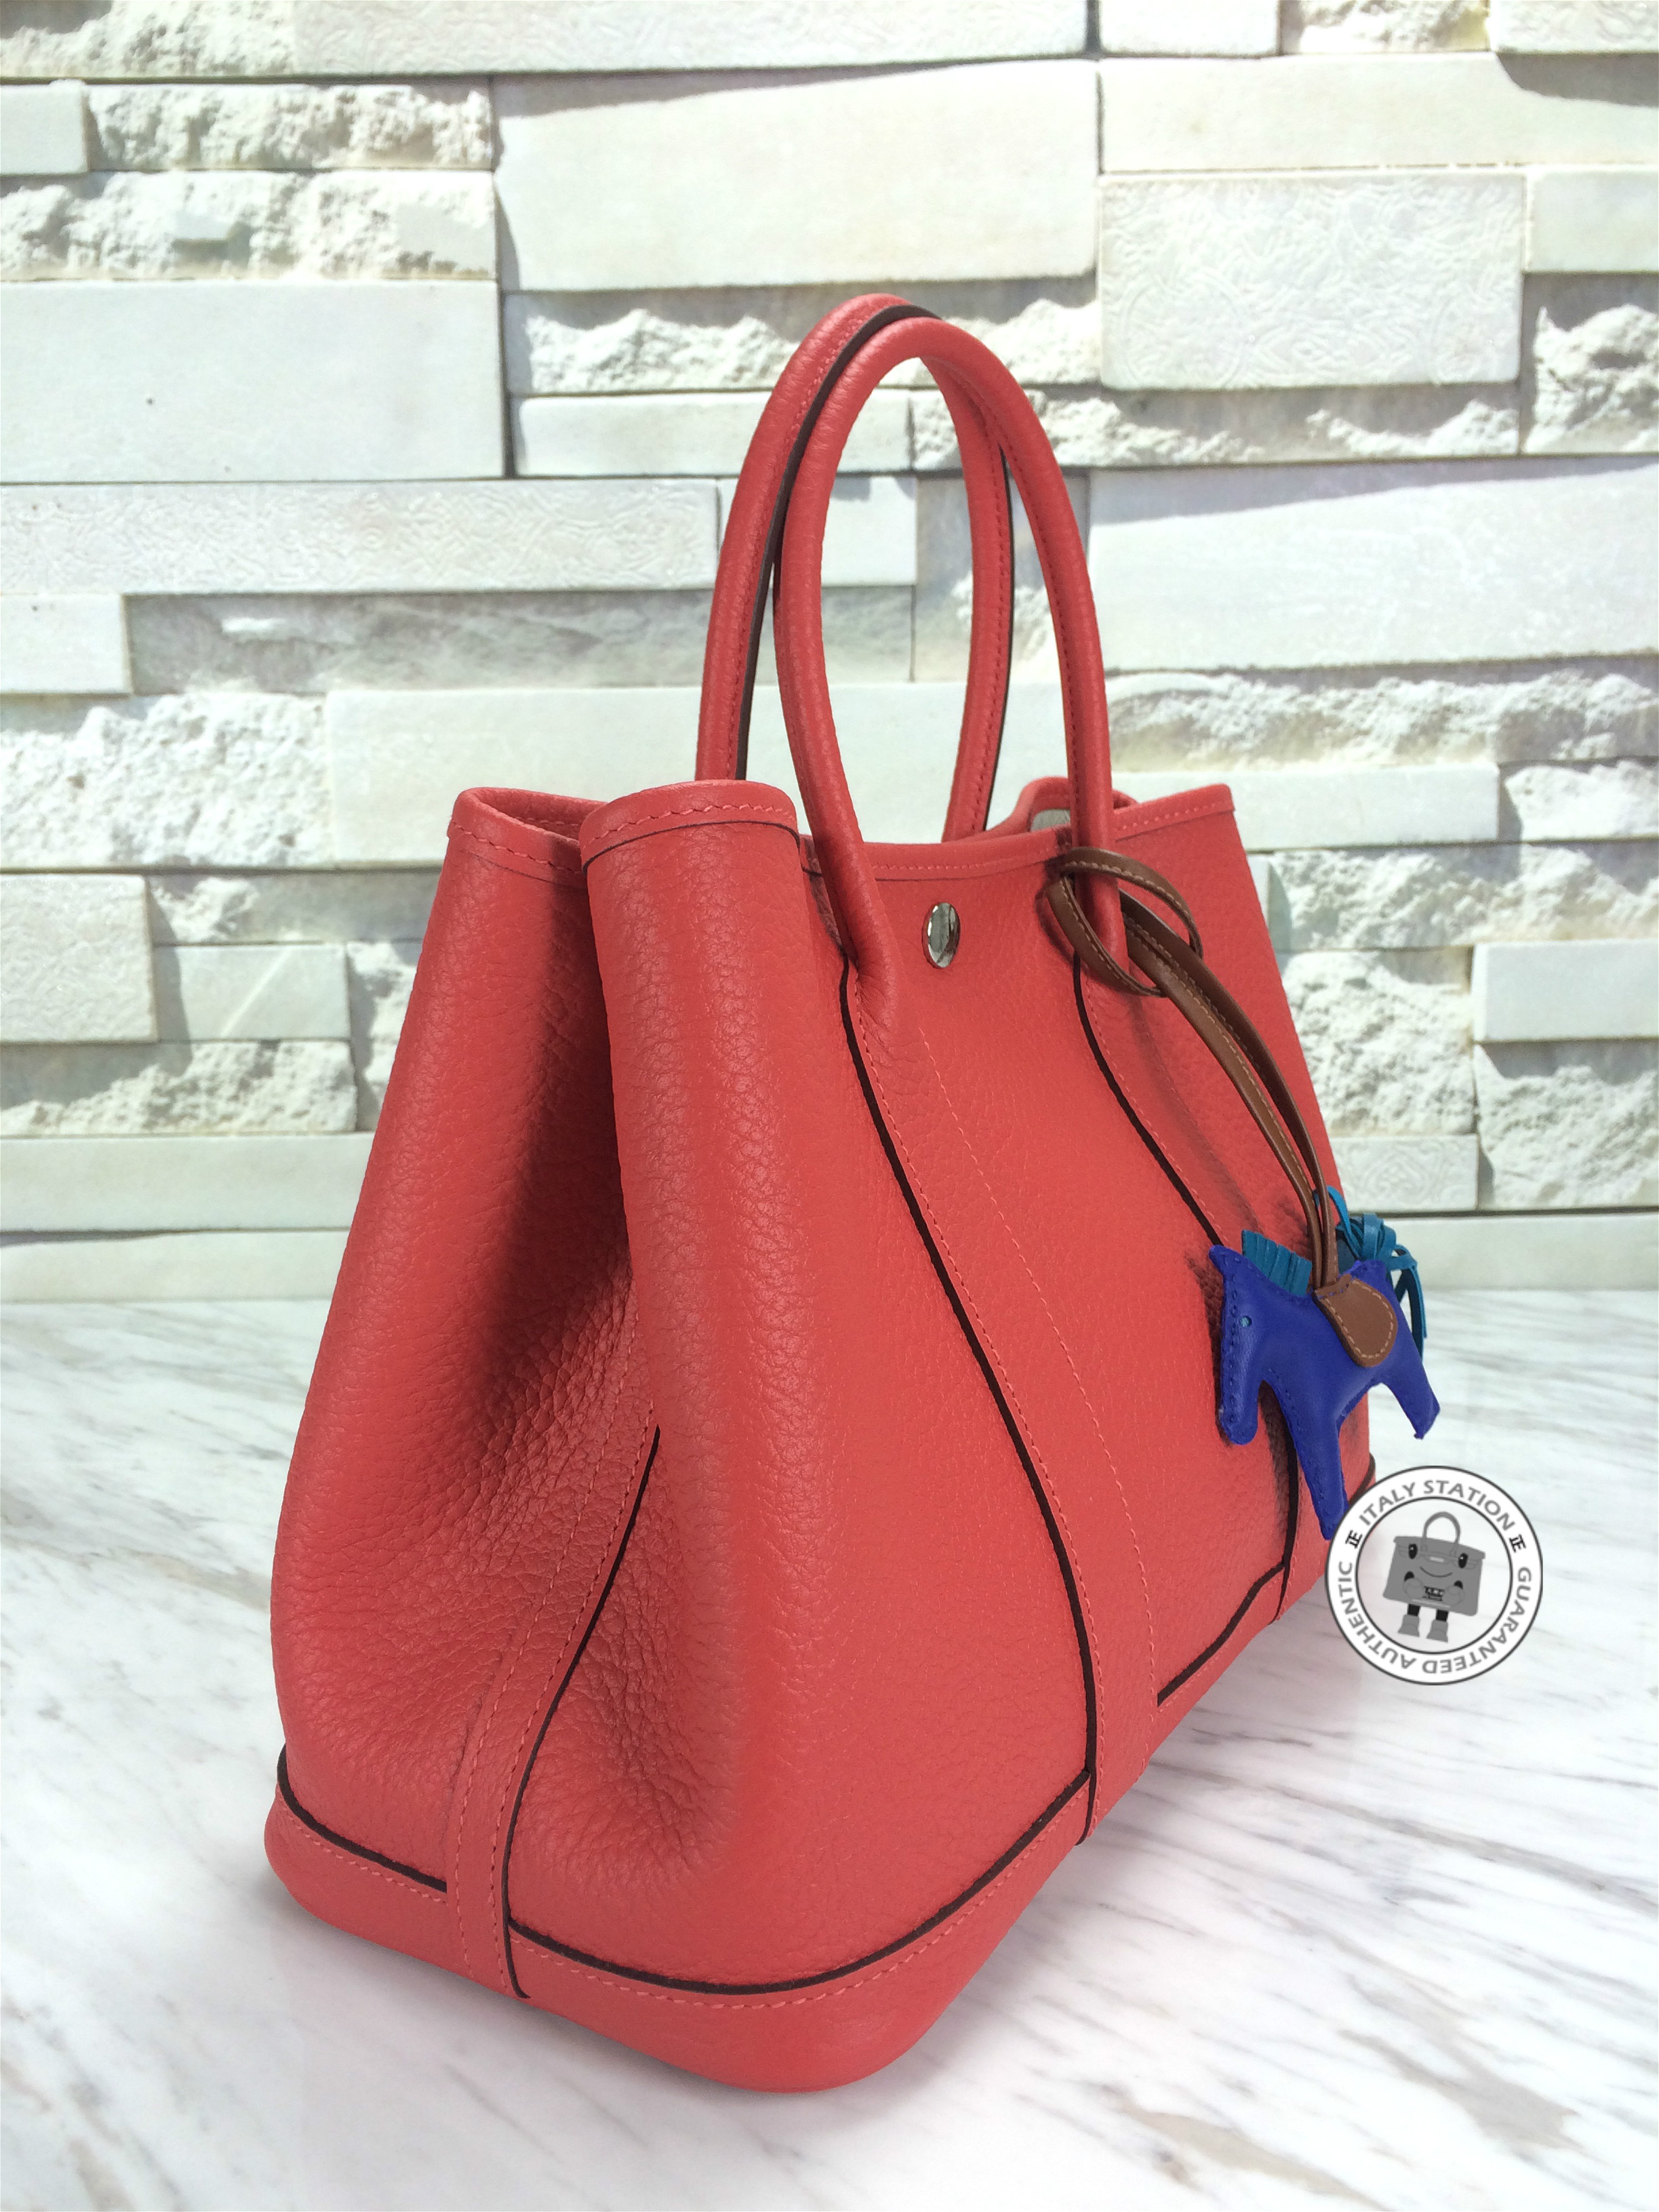 different styles of hermes bags - Hermes \u2013Garden Party TPM 30 ,Rouge Pivoine (2R) \u2013 �����վ ...